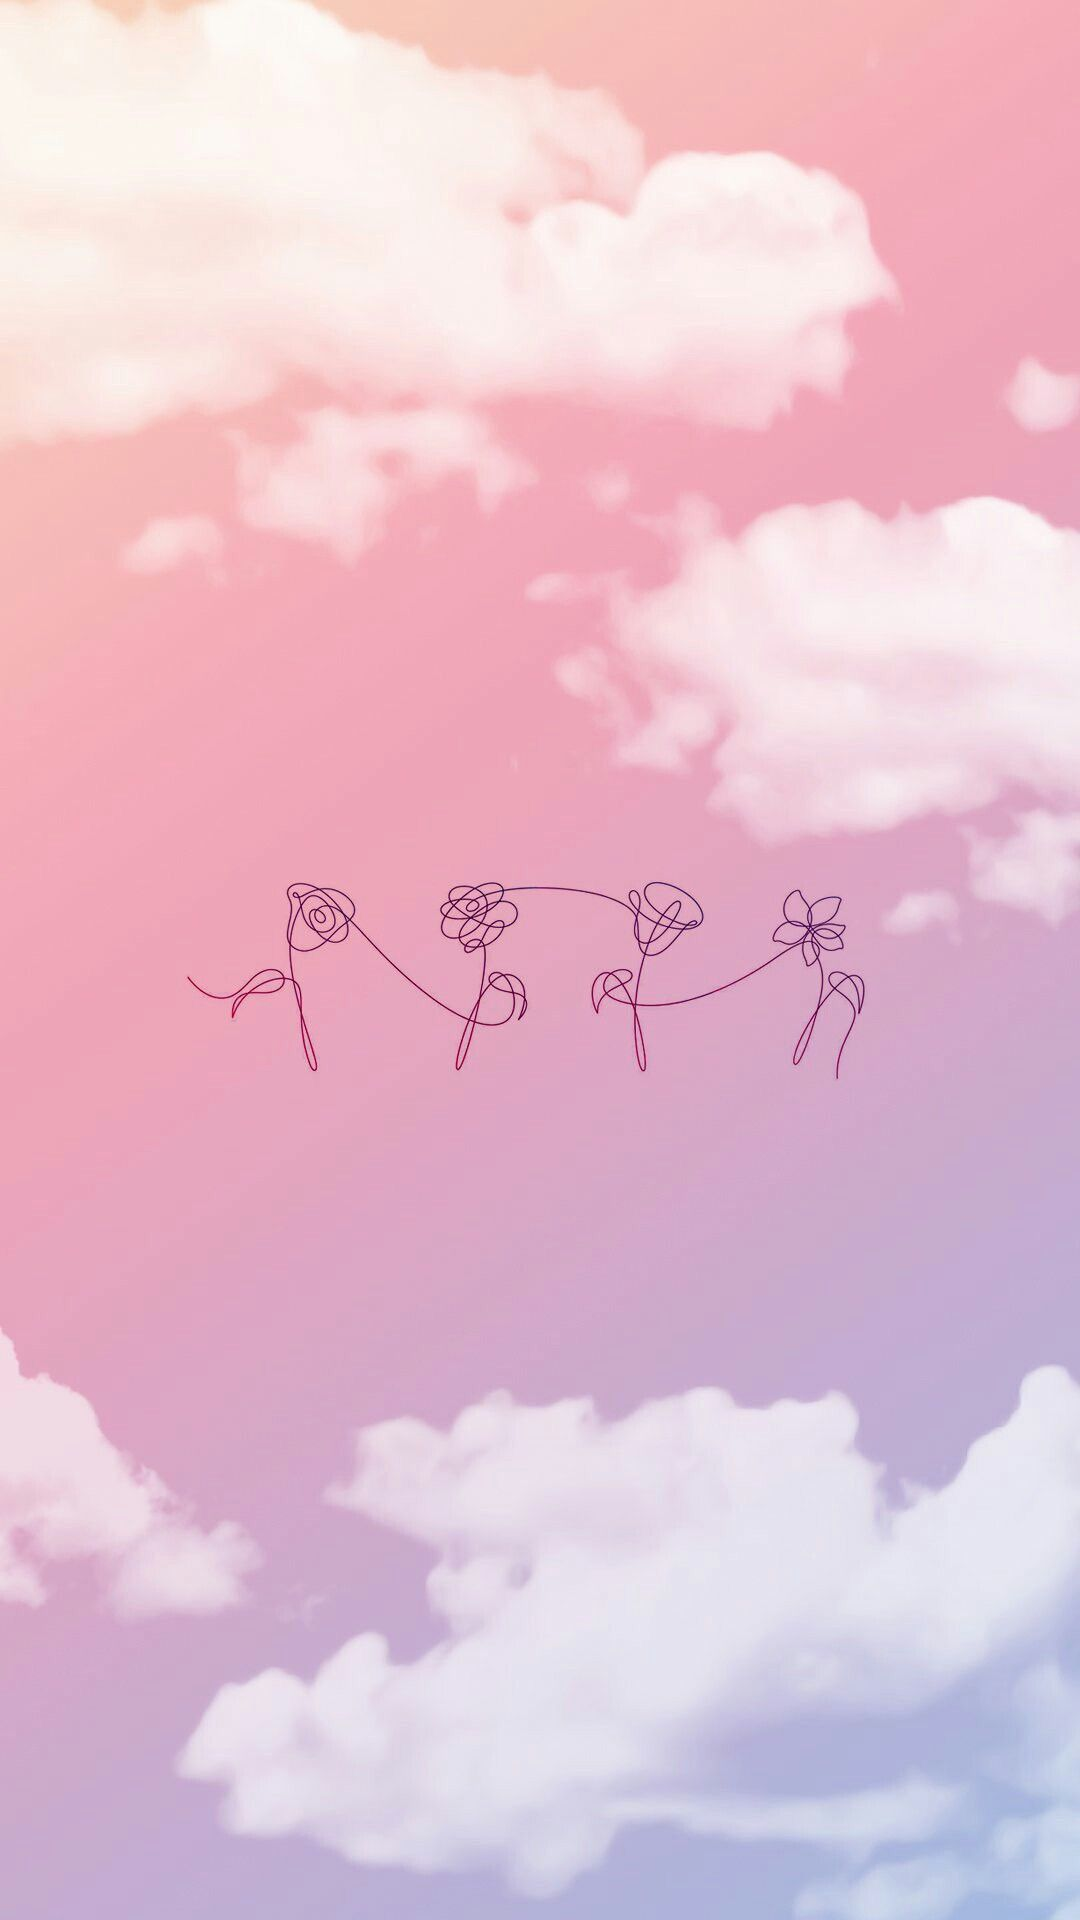 Love Yourself Flowers Bts Wallpaper Kpop Wallpaper Bts Wallpaper Bts Lockscreen